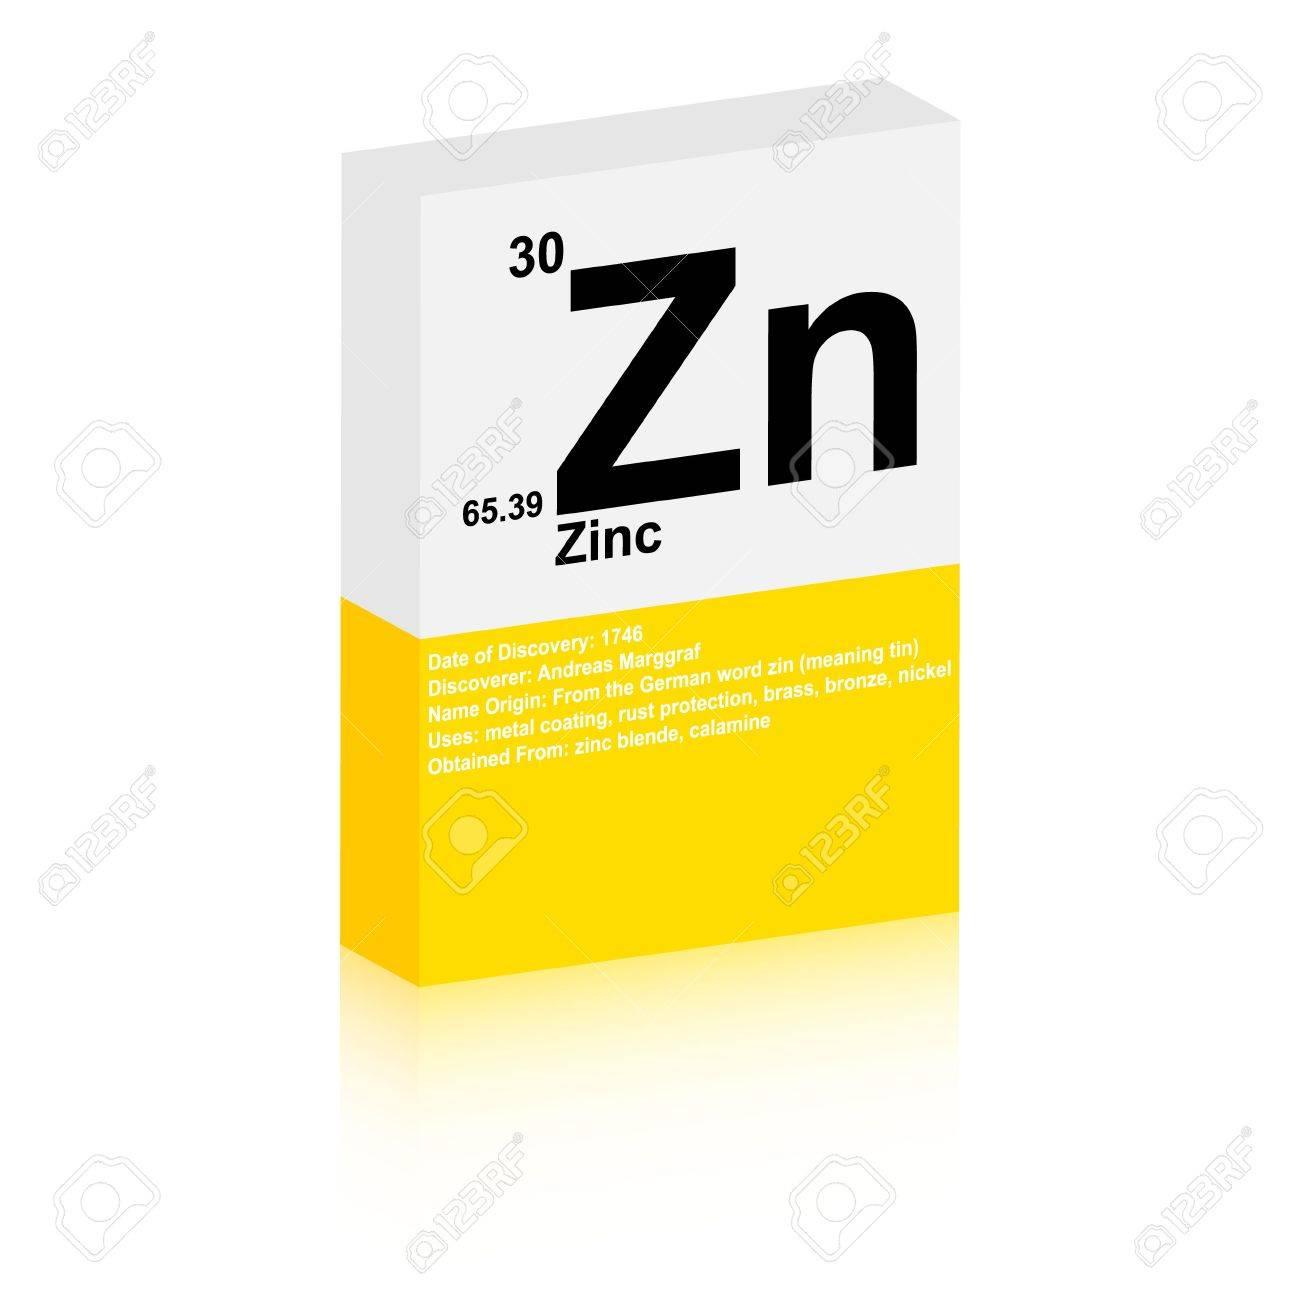 Zinc symbol royalty free cliparts vectors and stock illustration zinc symbol stock vector 13345237 buycottarizona Gallery